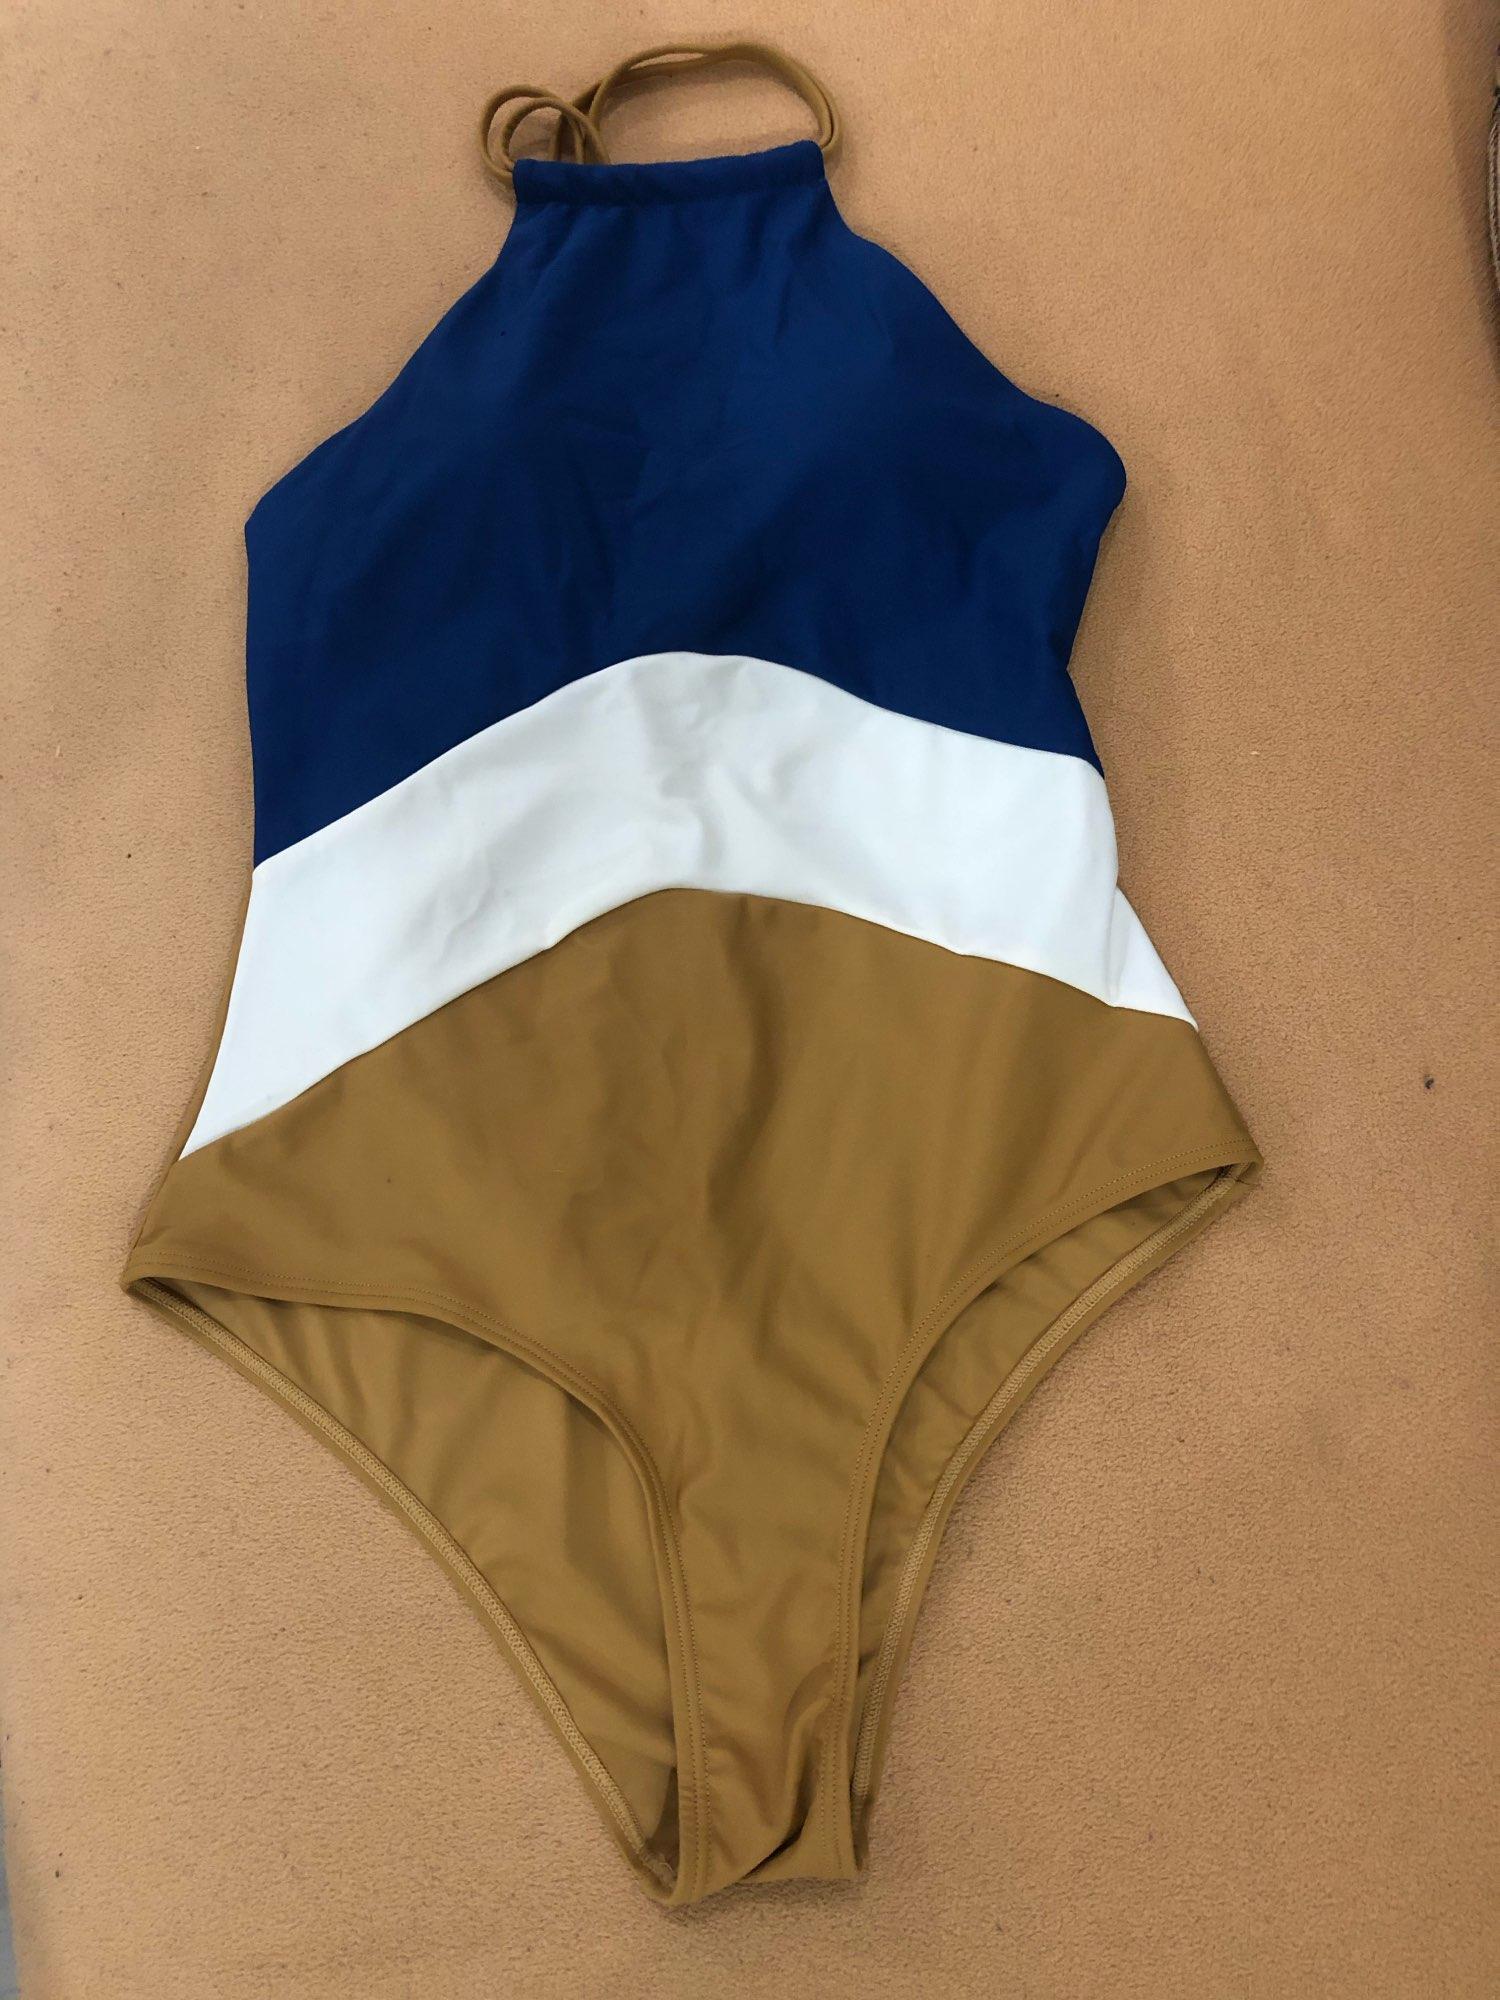 2019 Patchwork One Piece Swimsuit Swimwear High Neck Bodysuit Bathing Suit Women Piece Swimwear Beach Wear Monokini|Body Suits|   - AliExpress